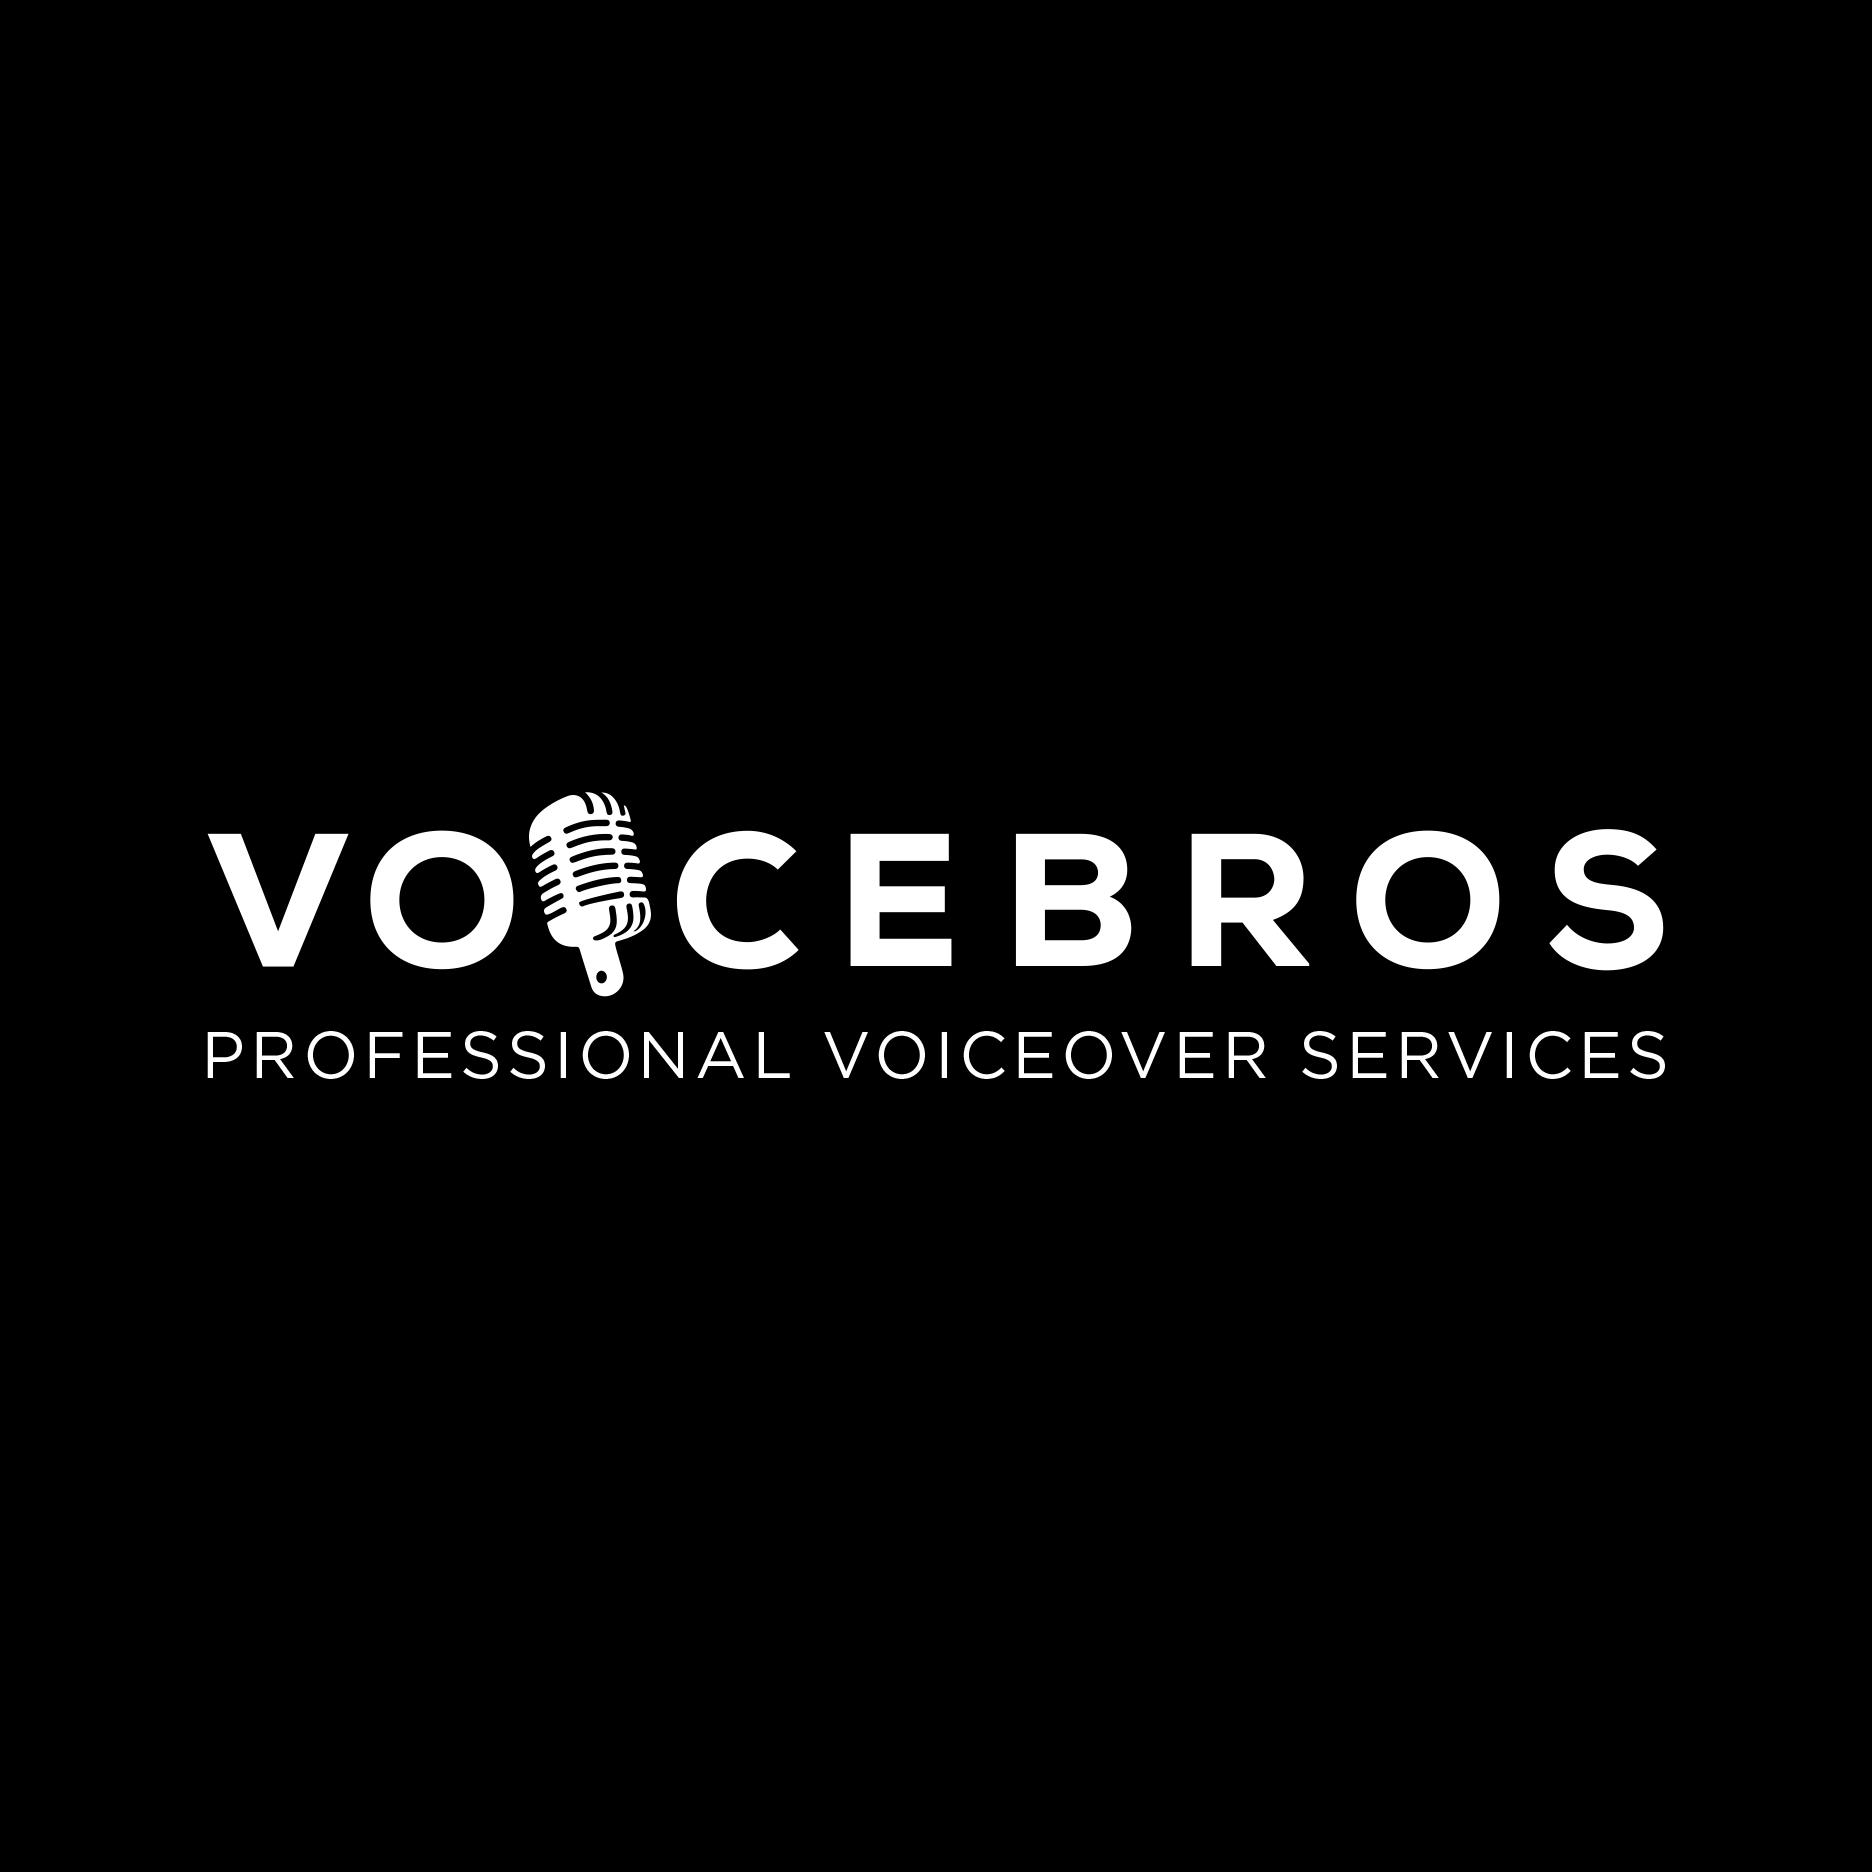 Martin Taskov is a voice over actor